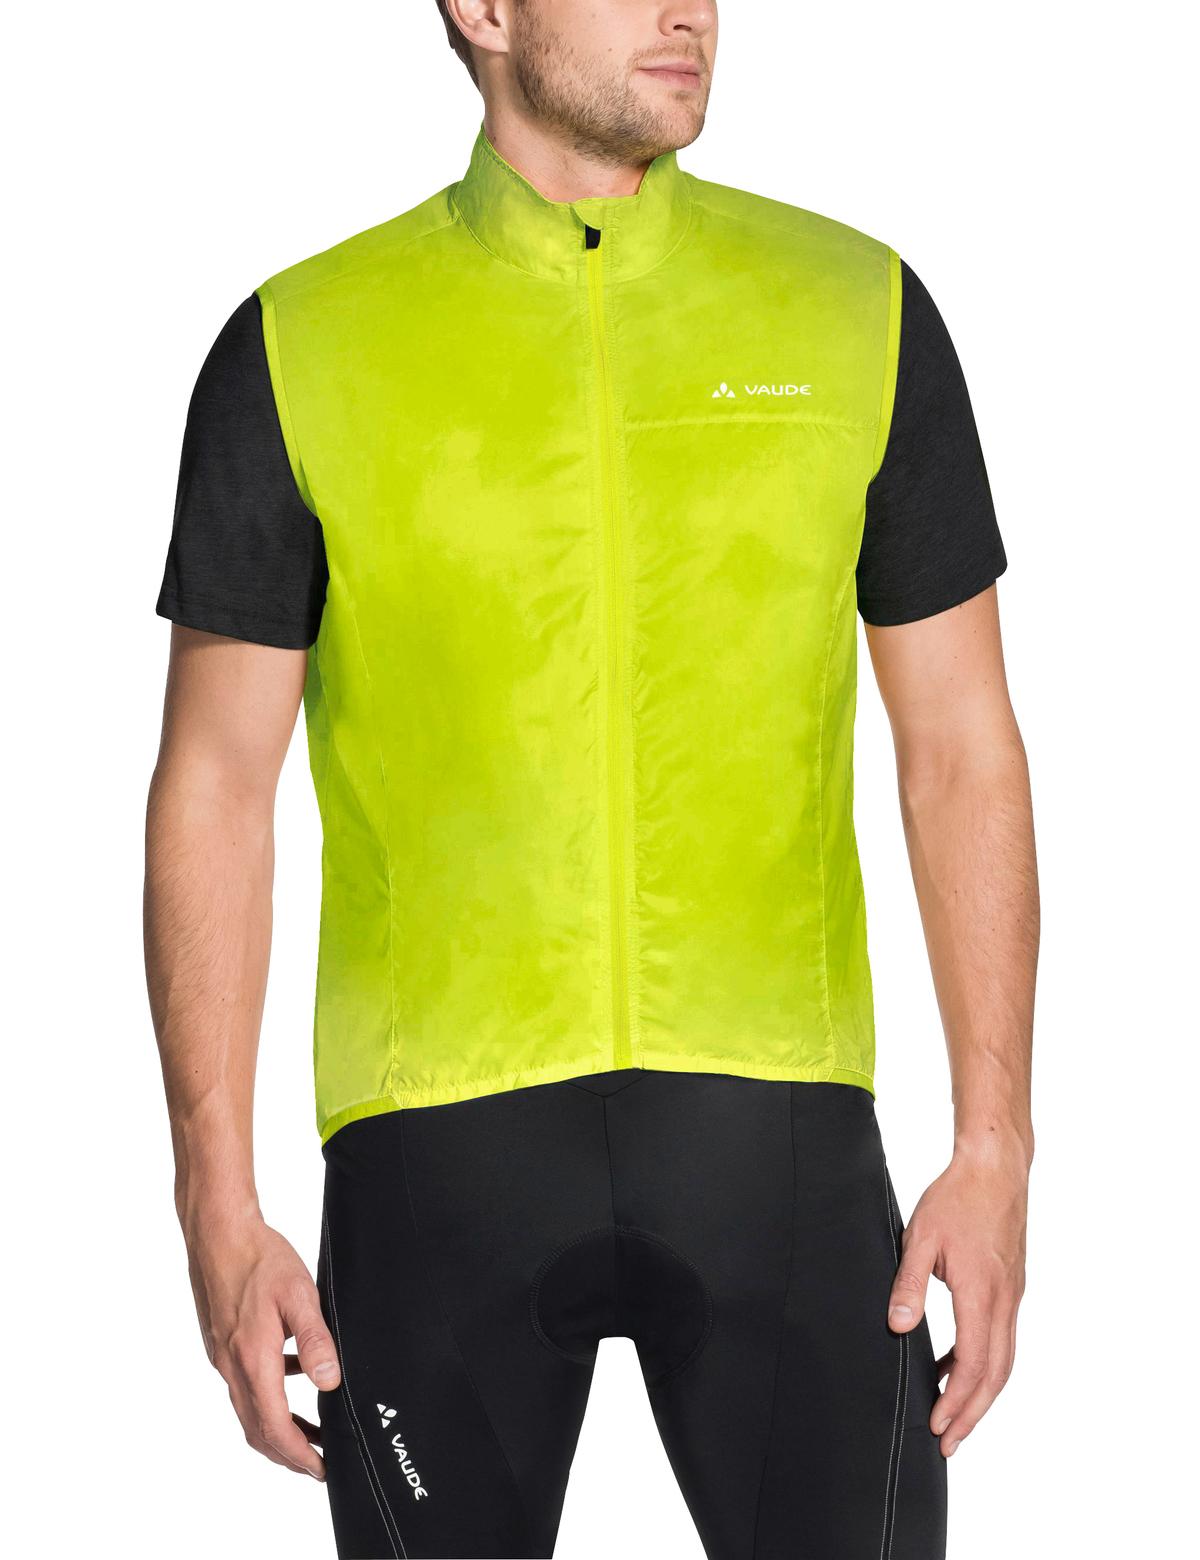 Vaude Moab Ultra Light Vest Messieurs-Gilet Radweste windweste vélo Bike Outdoor